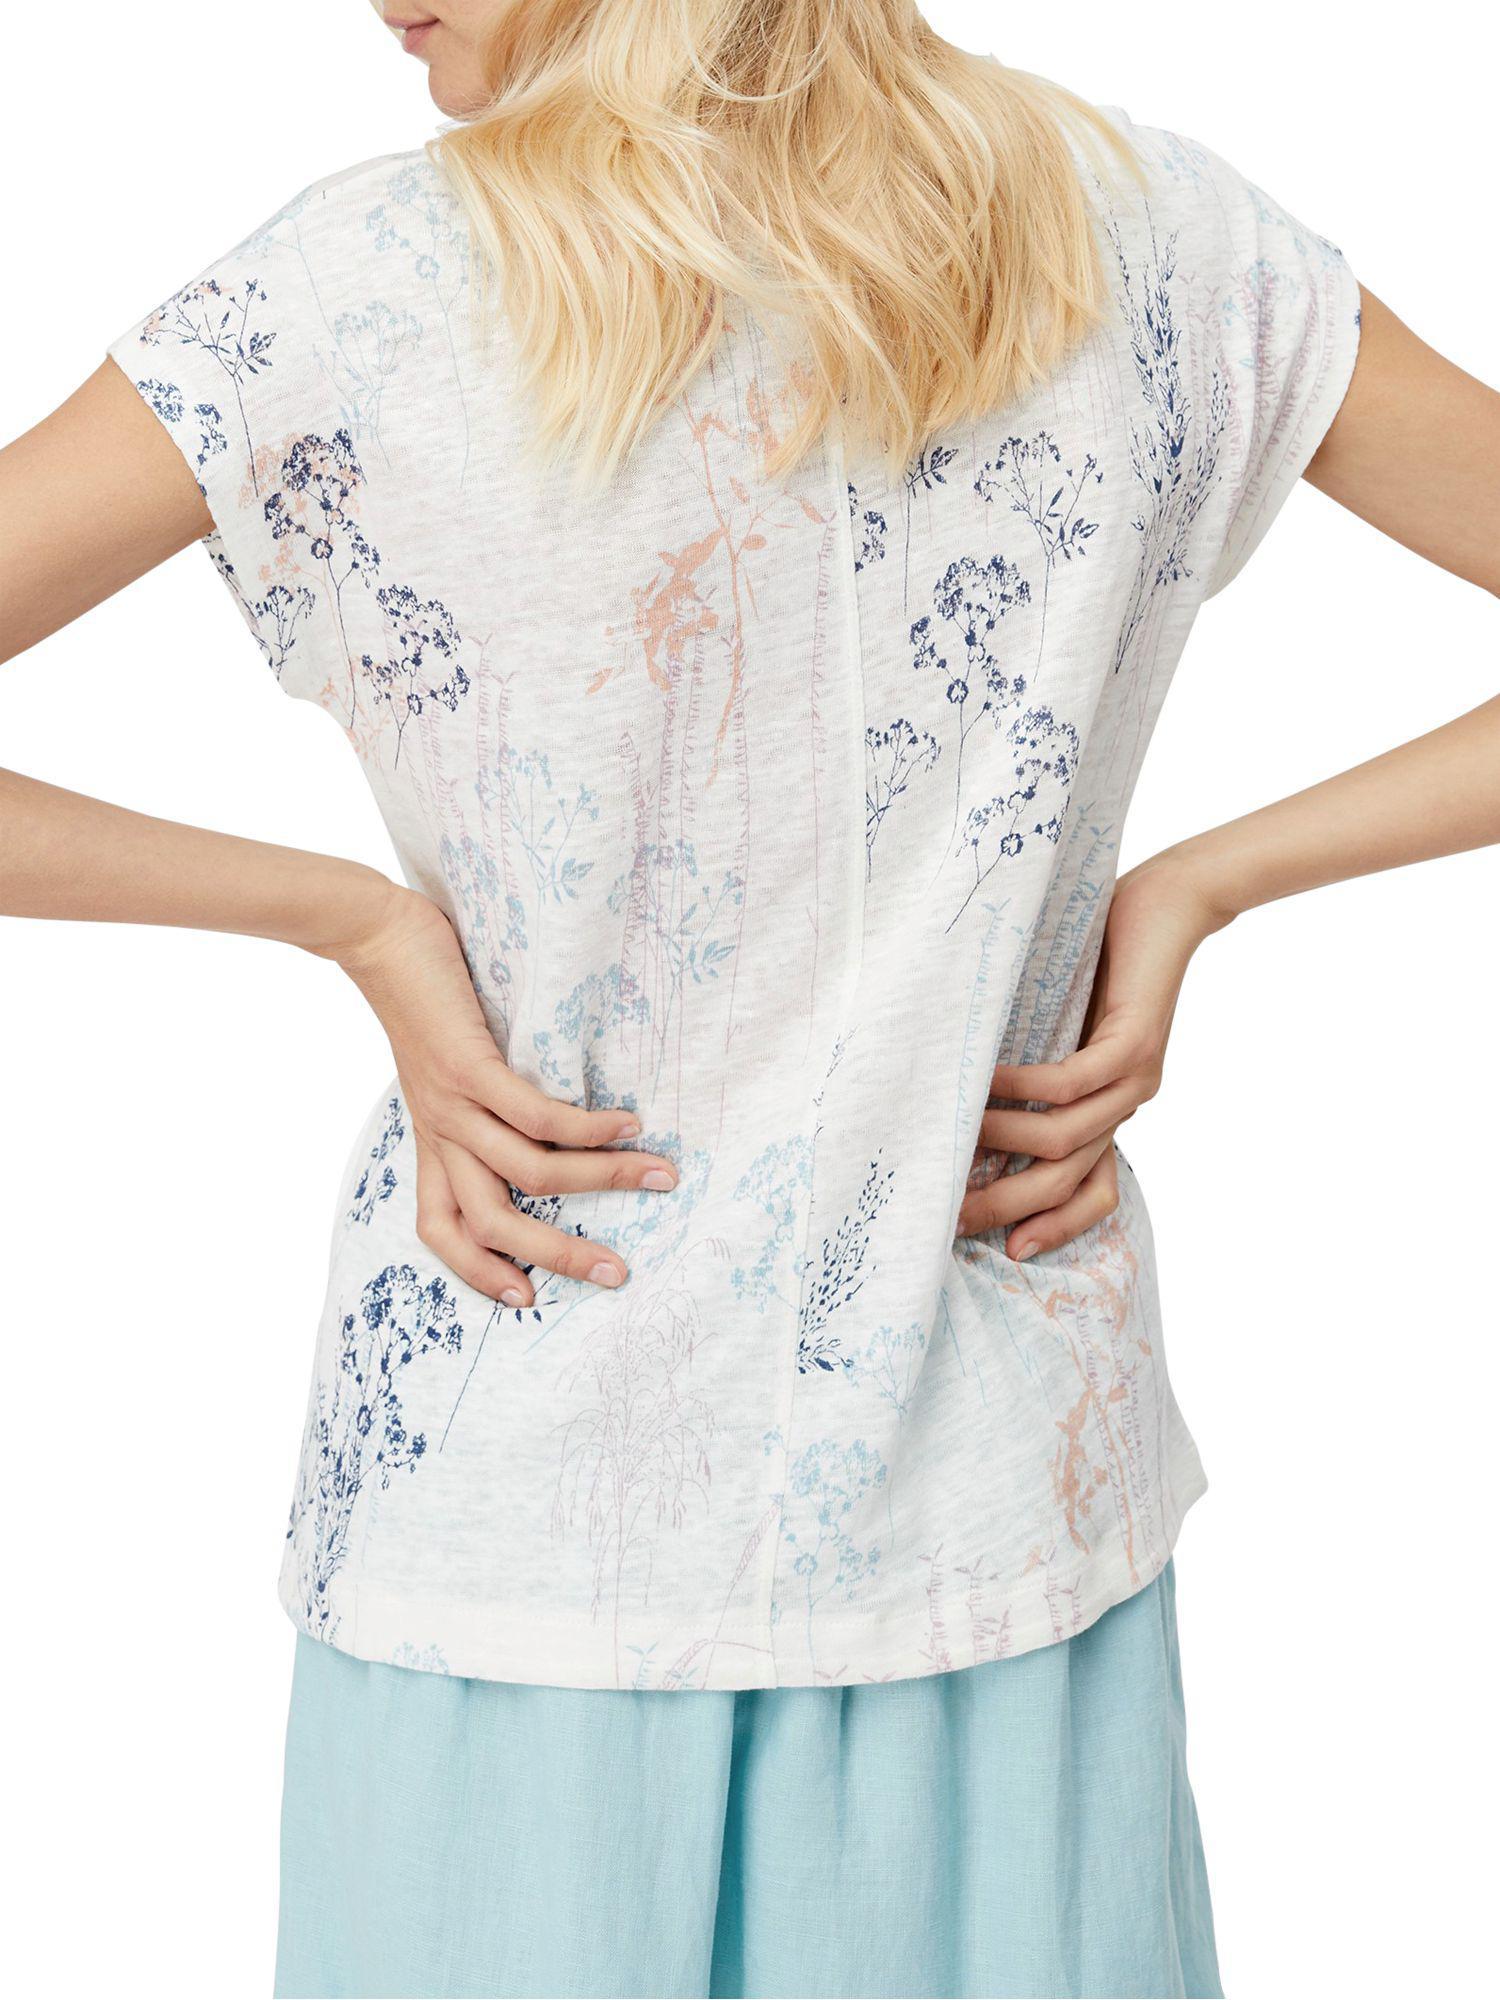 c6a1dfbad9f White Stuff Summer Print Highline Linen Jersey T-shirt in White - Lyst